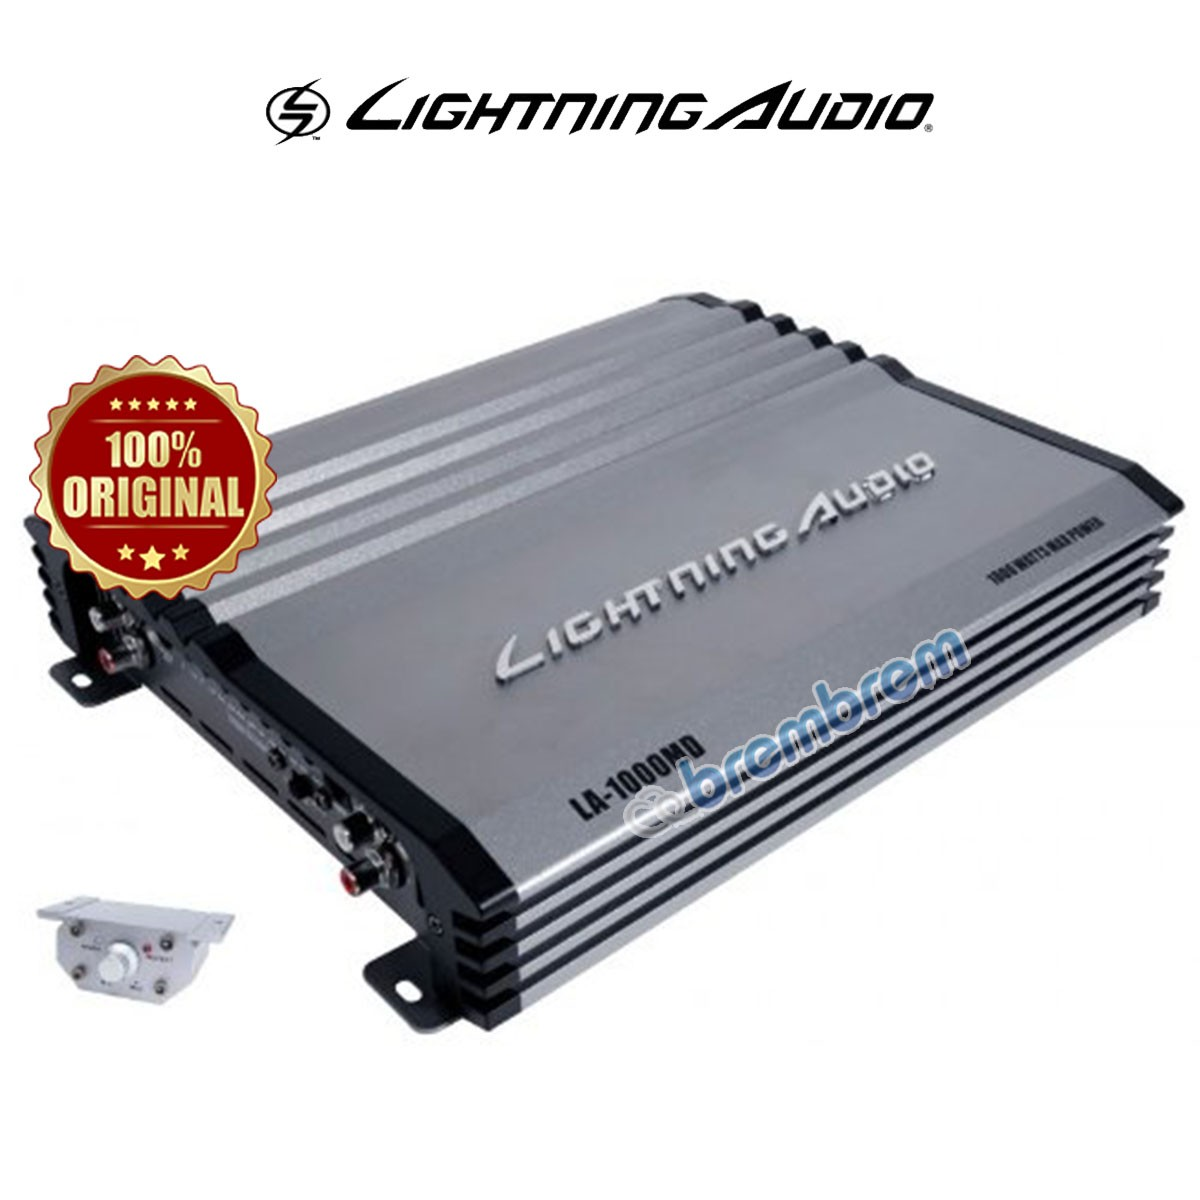 LIGHTNING AUDIO LA1000MD - POWER MONOBLOCK